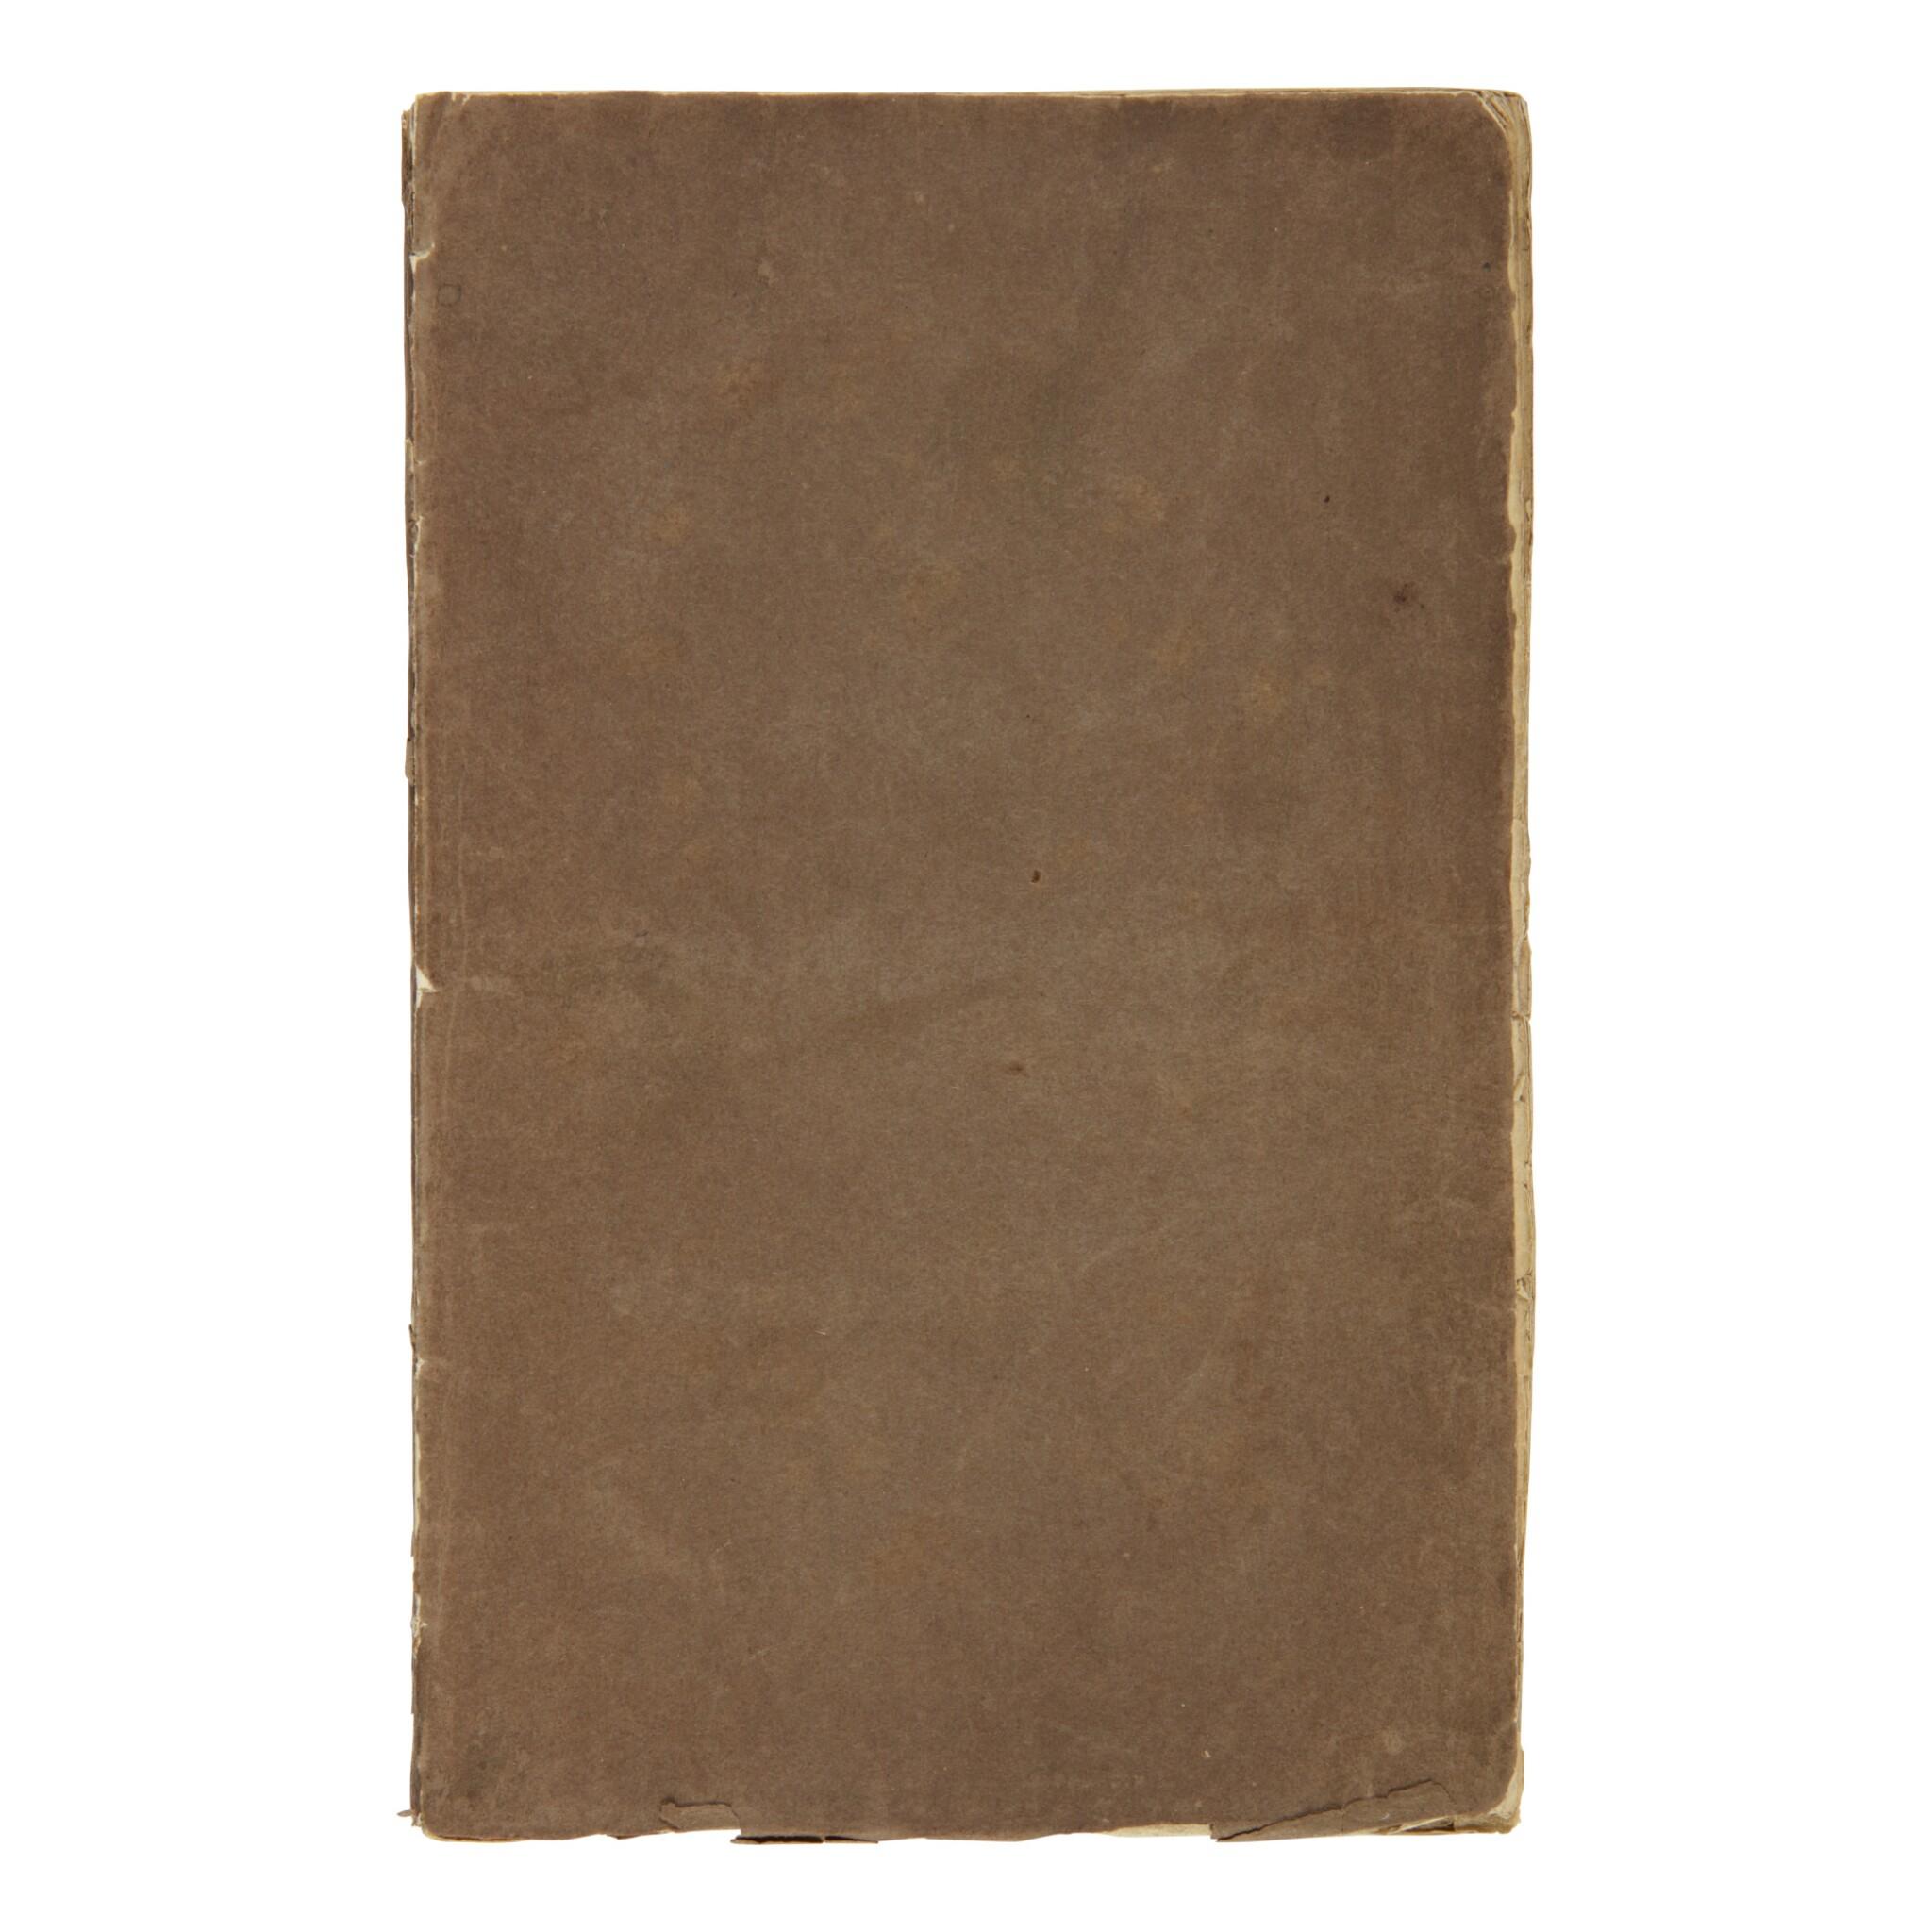 BYRON, GEORGE GORDON, LORD | Hebrew Melodies. London: John Murray, 1815